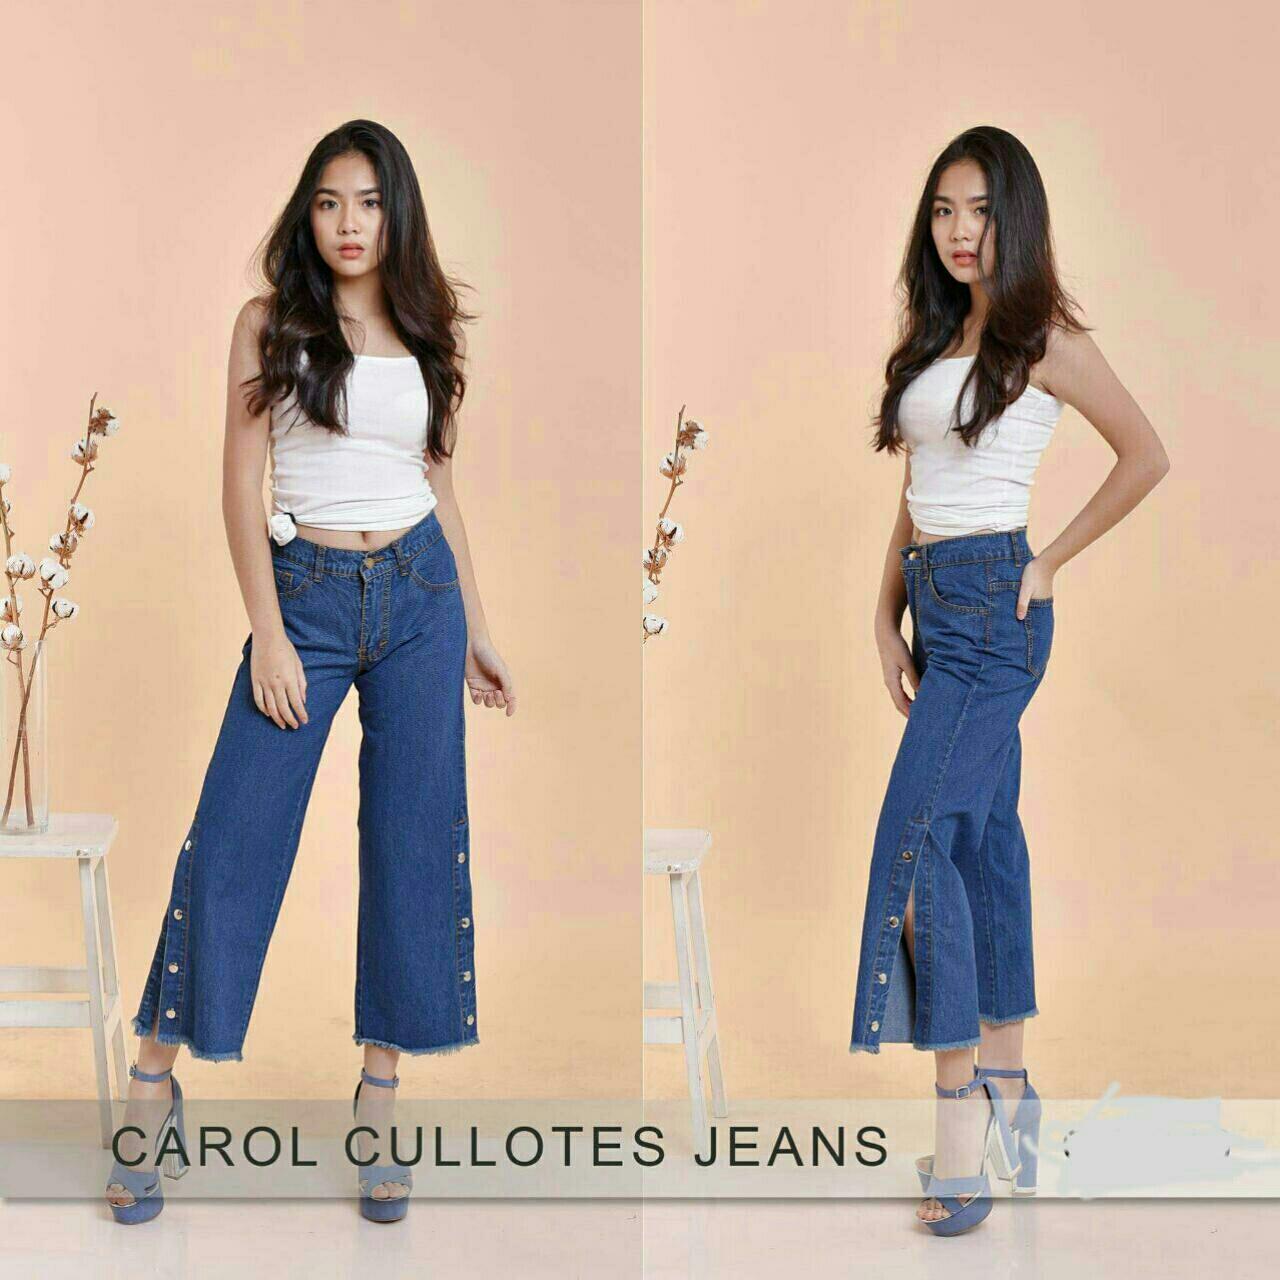 CaroL cullotes jeans